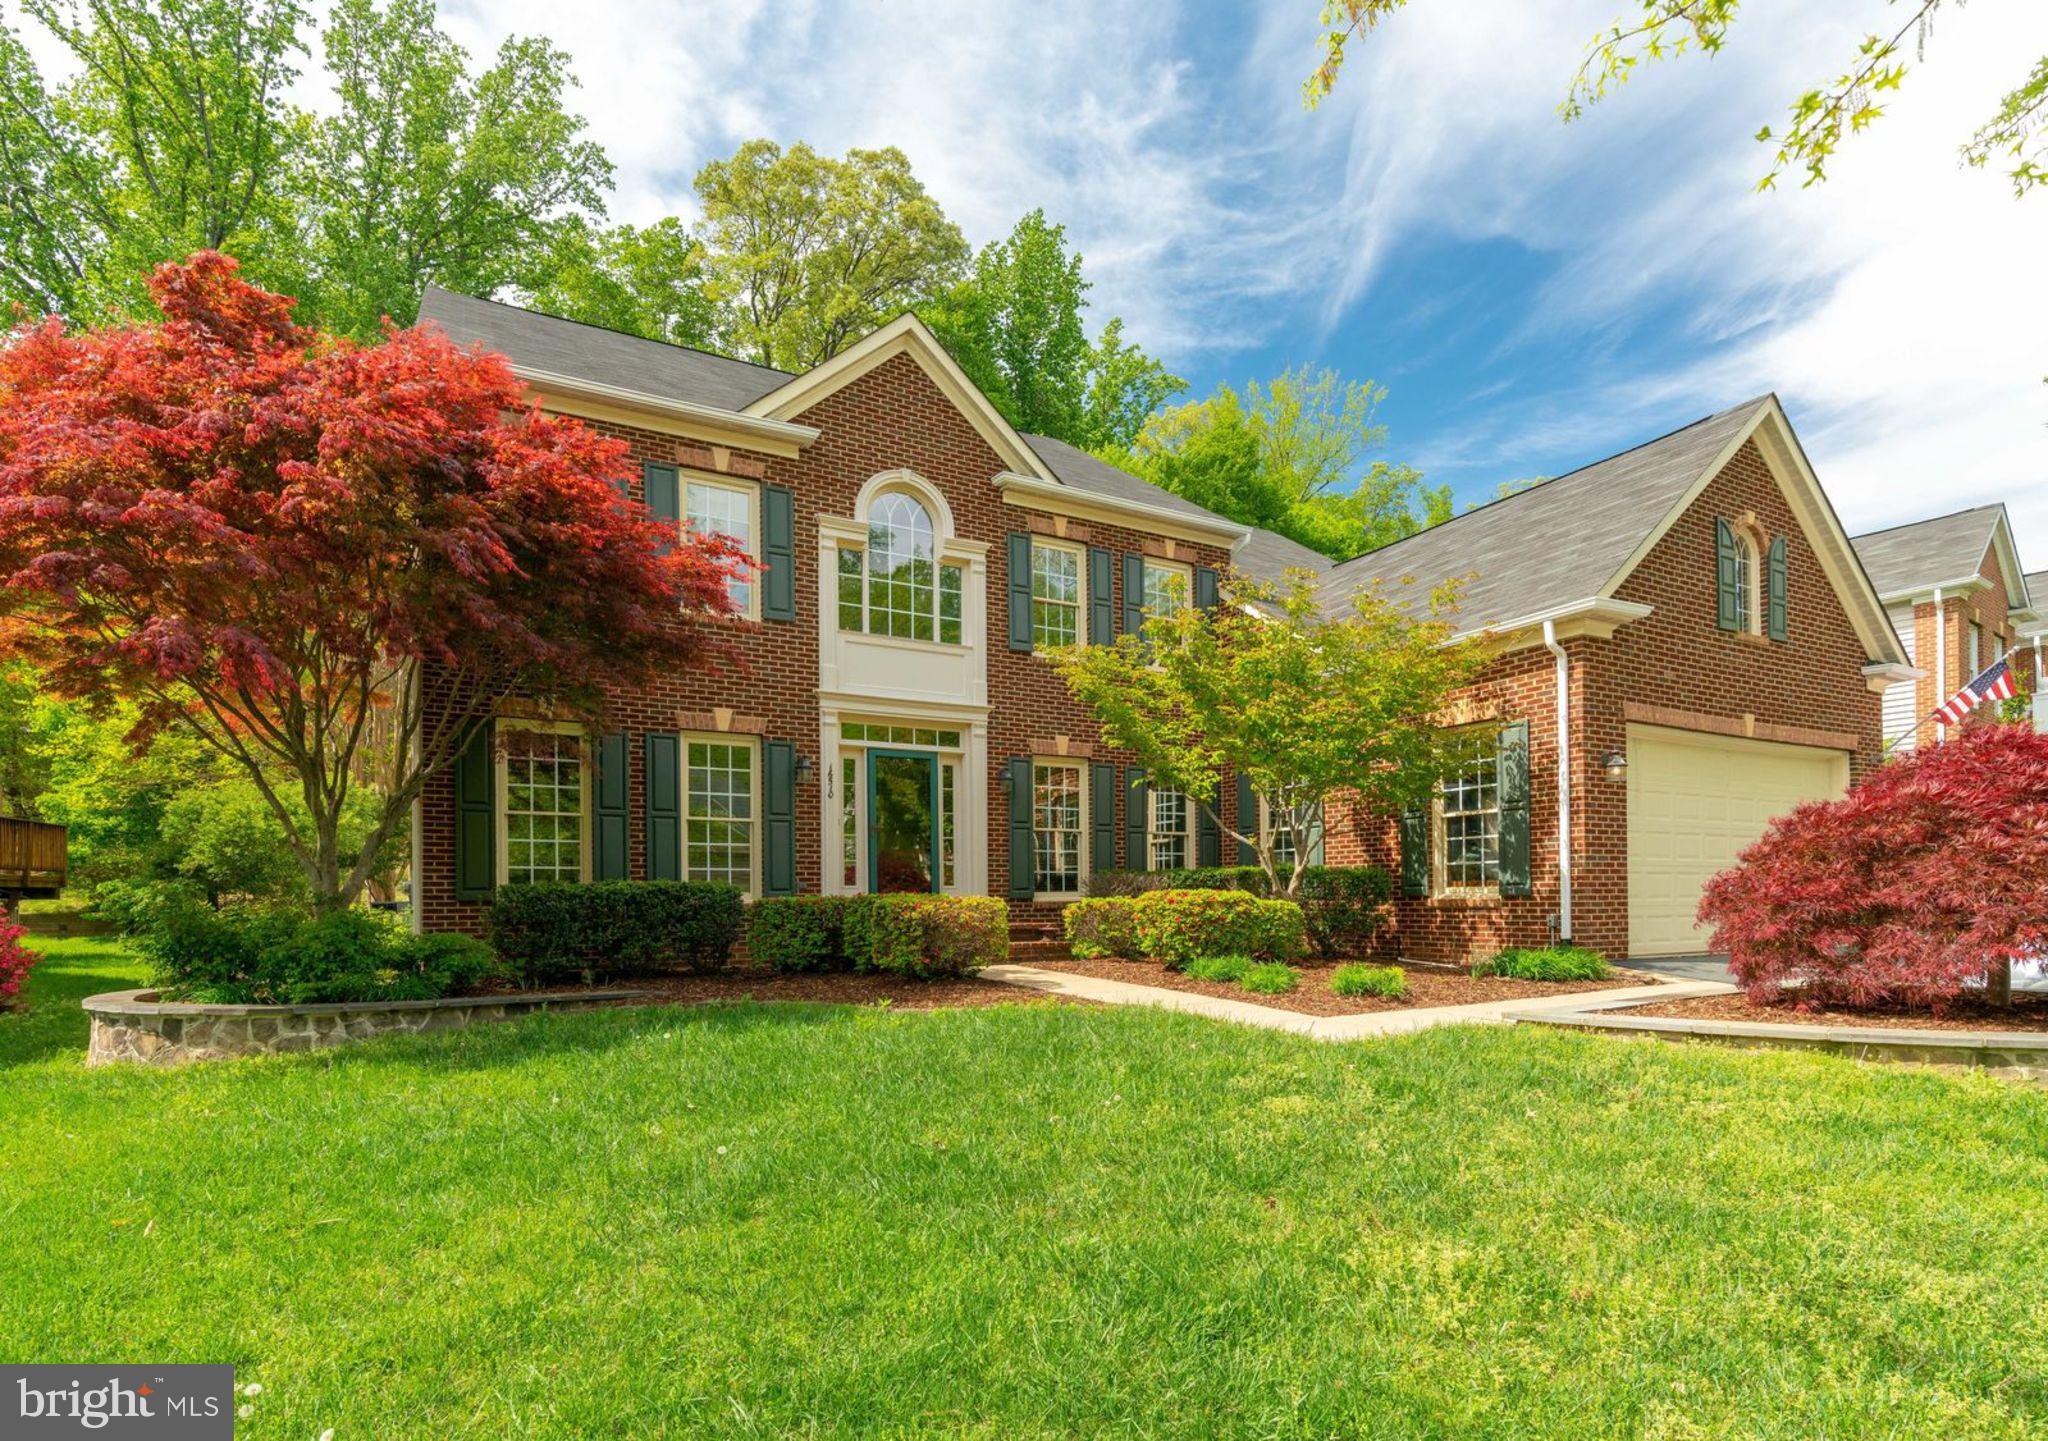 16510 Hayes Ln, Woodbridge, VA, 22191